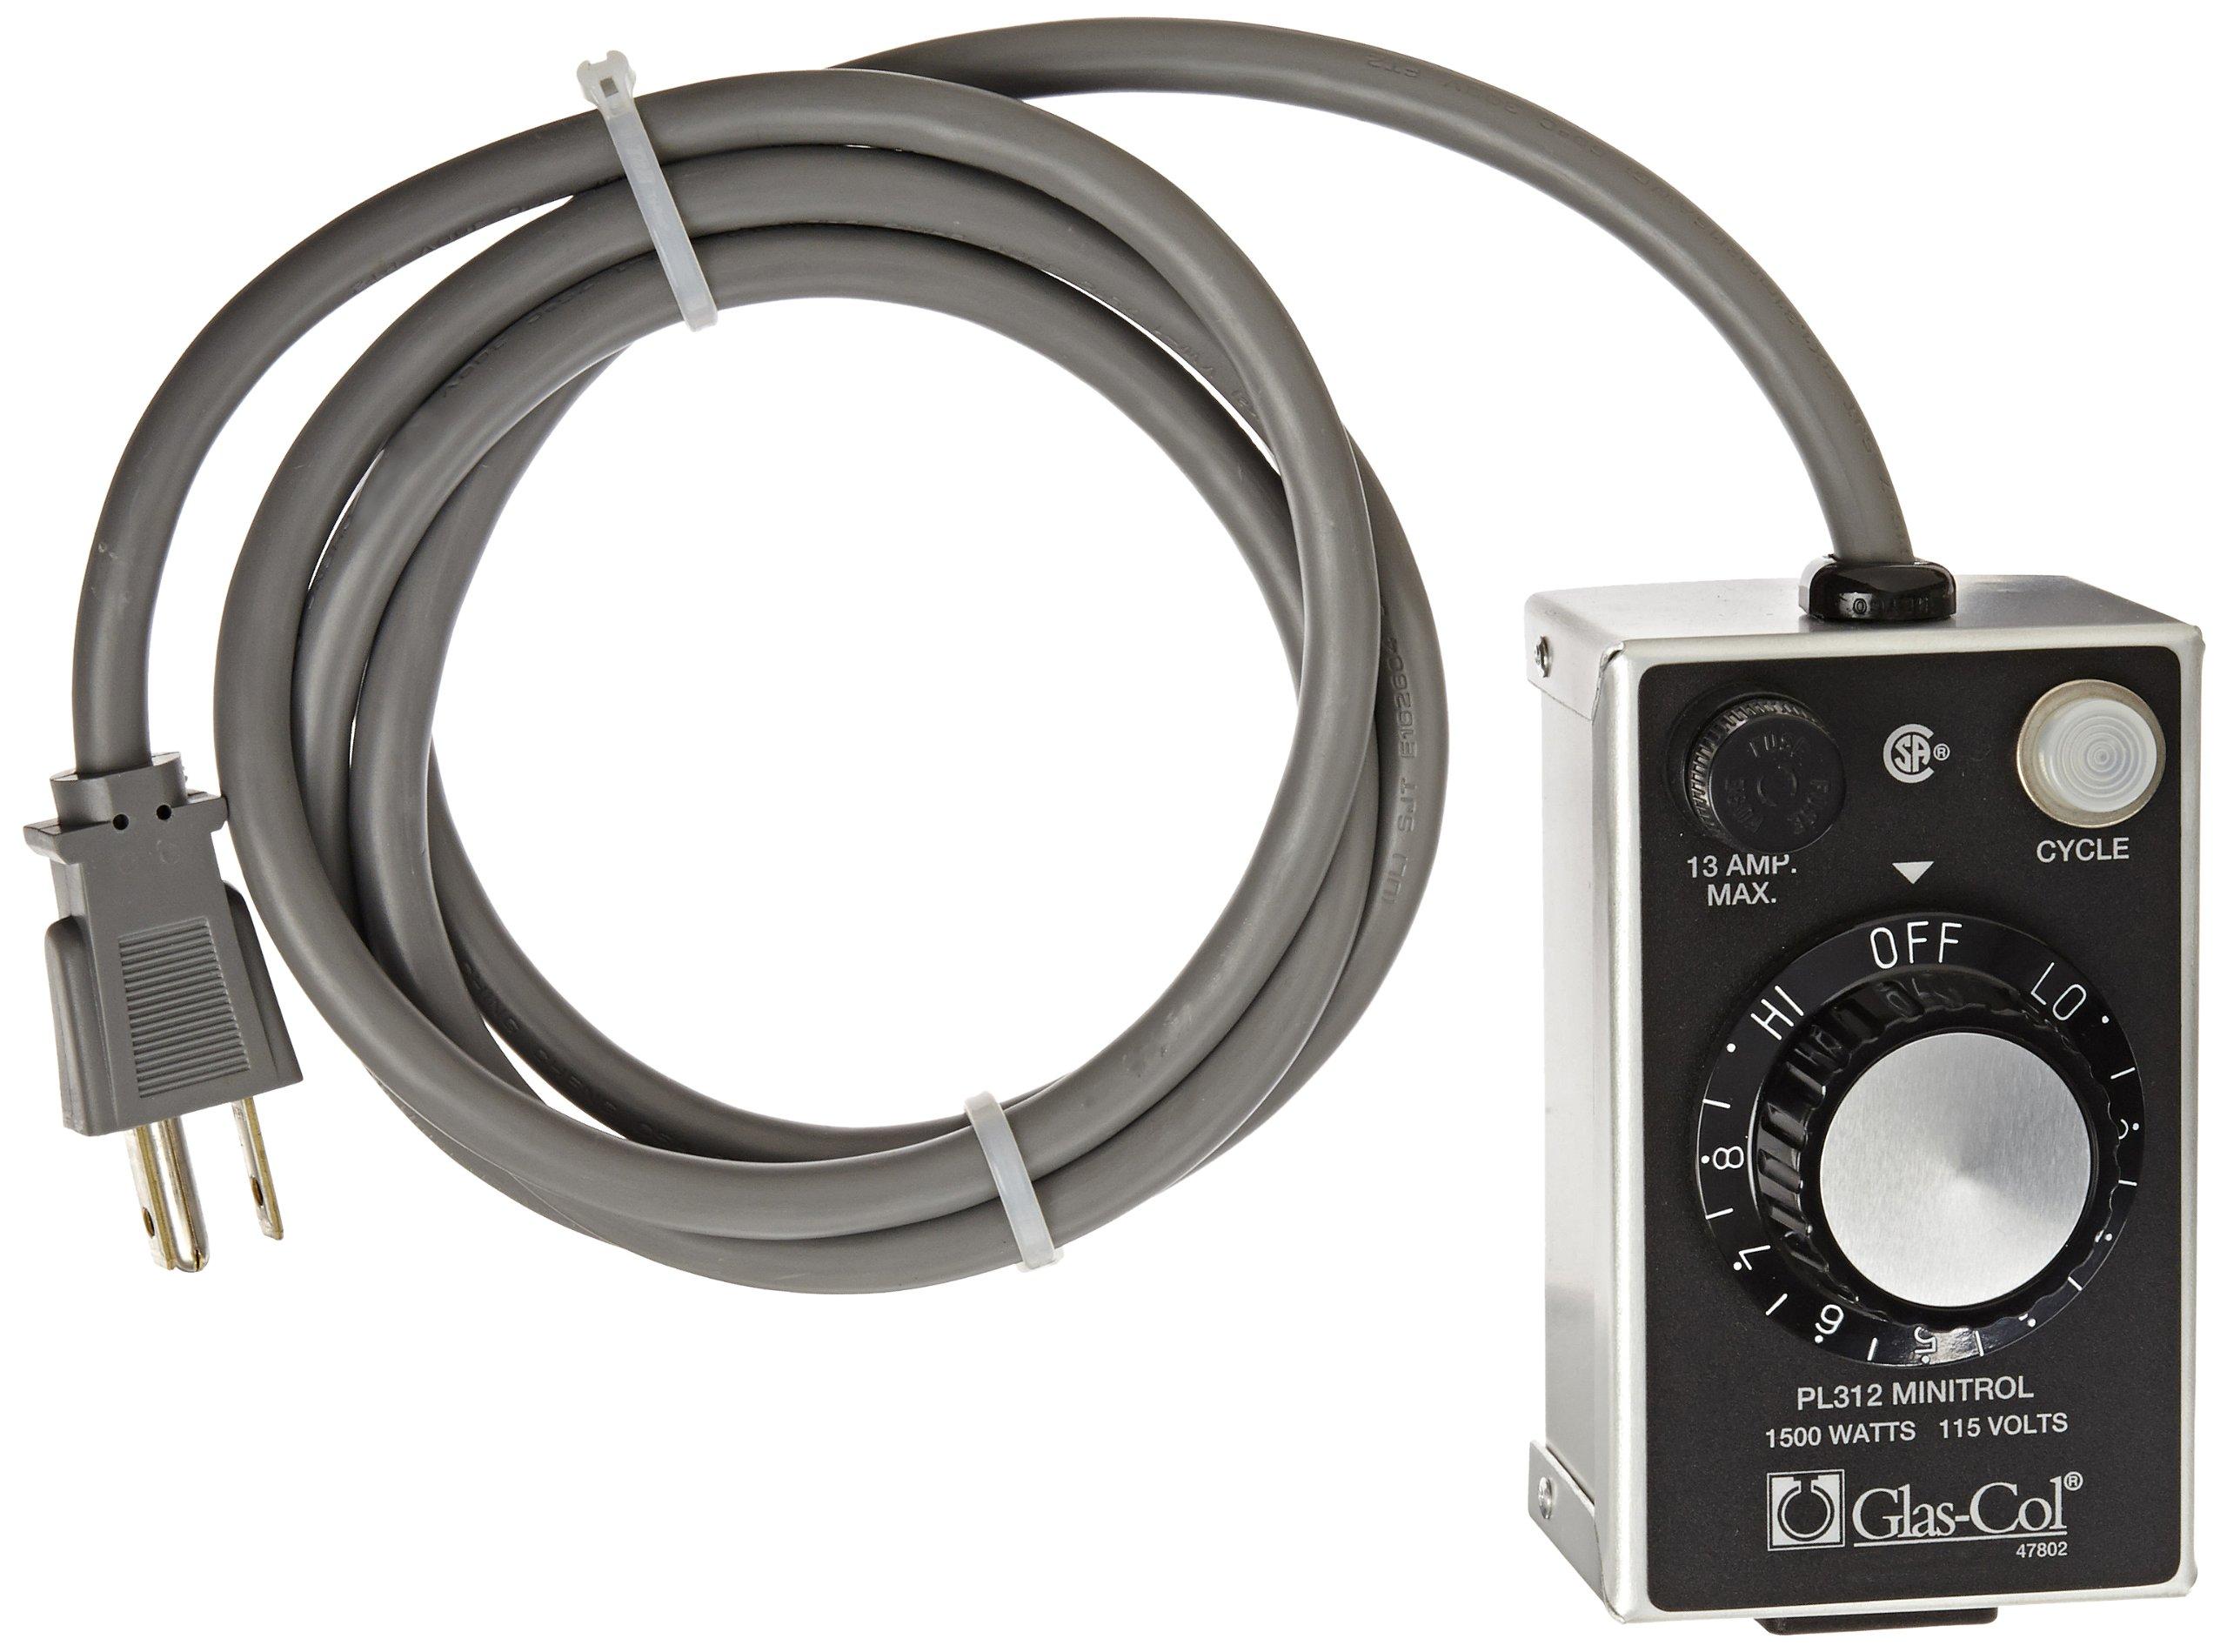 Glas-Col 104A PL312 MiniTrol Temperature Control, 120V, 1440W Capacity